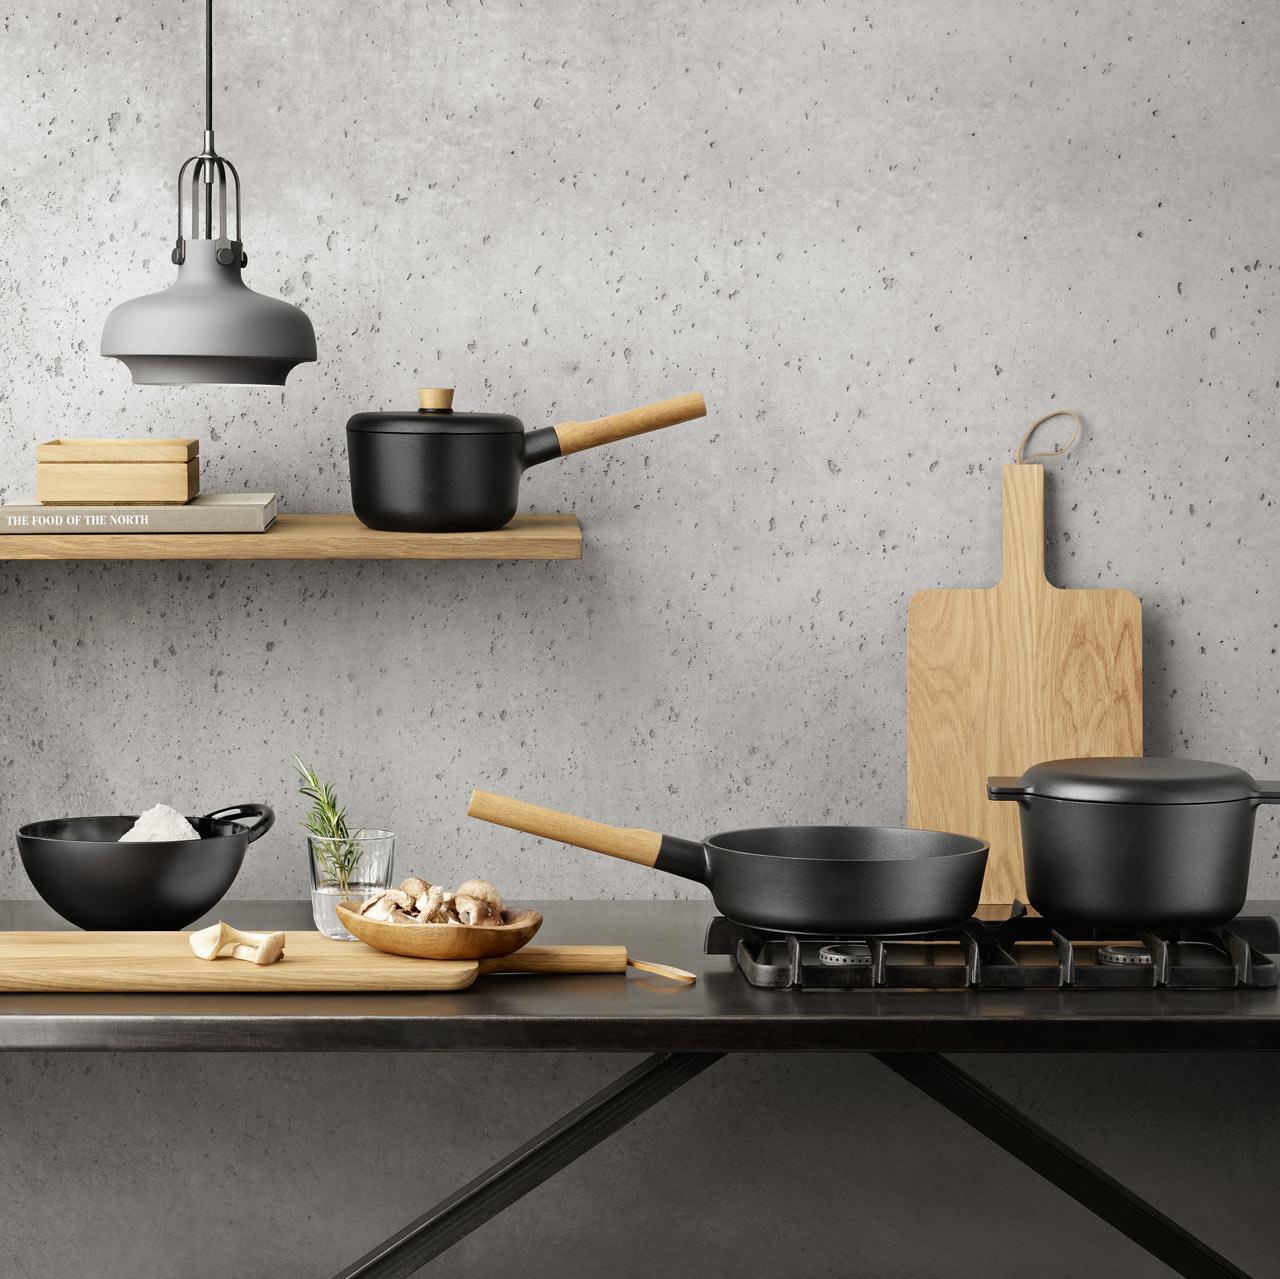 Nordic Kitchen Scandinavian Kitchenware By Eva Solo